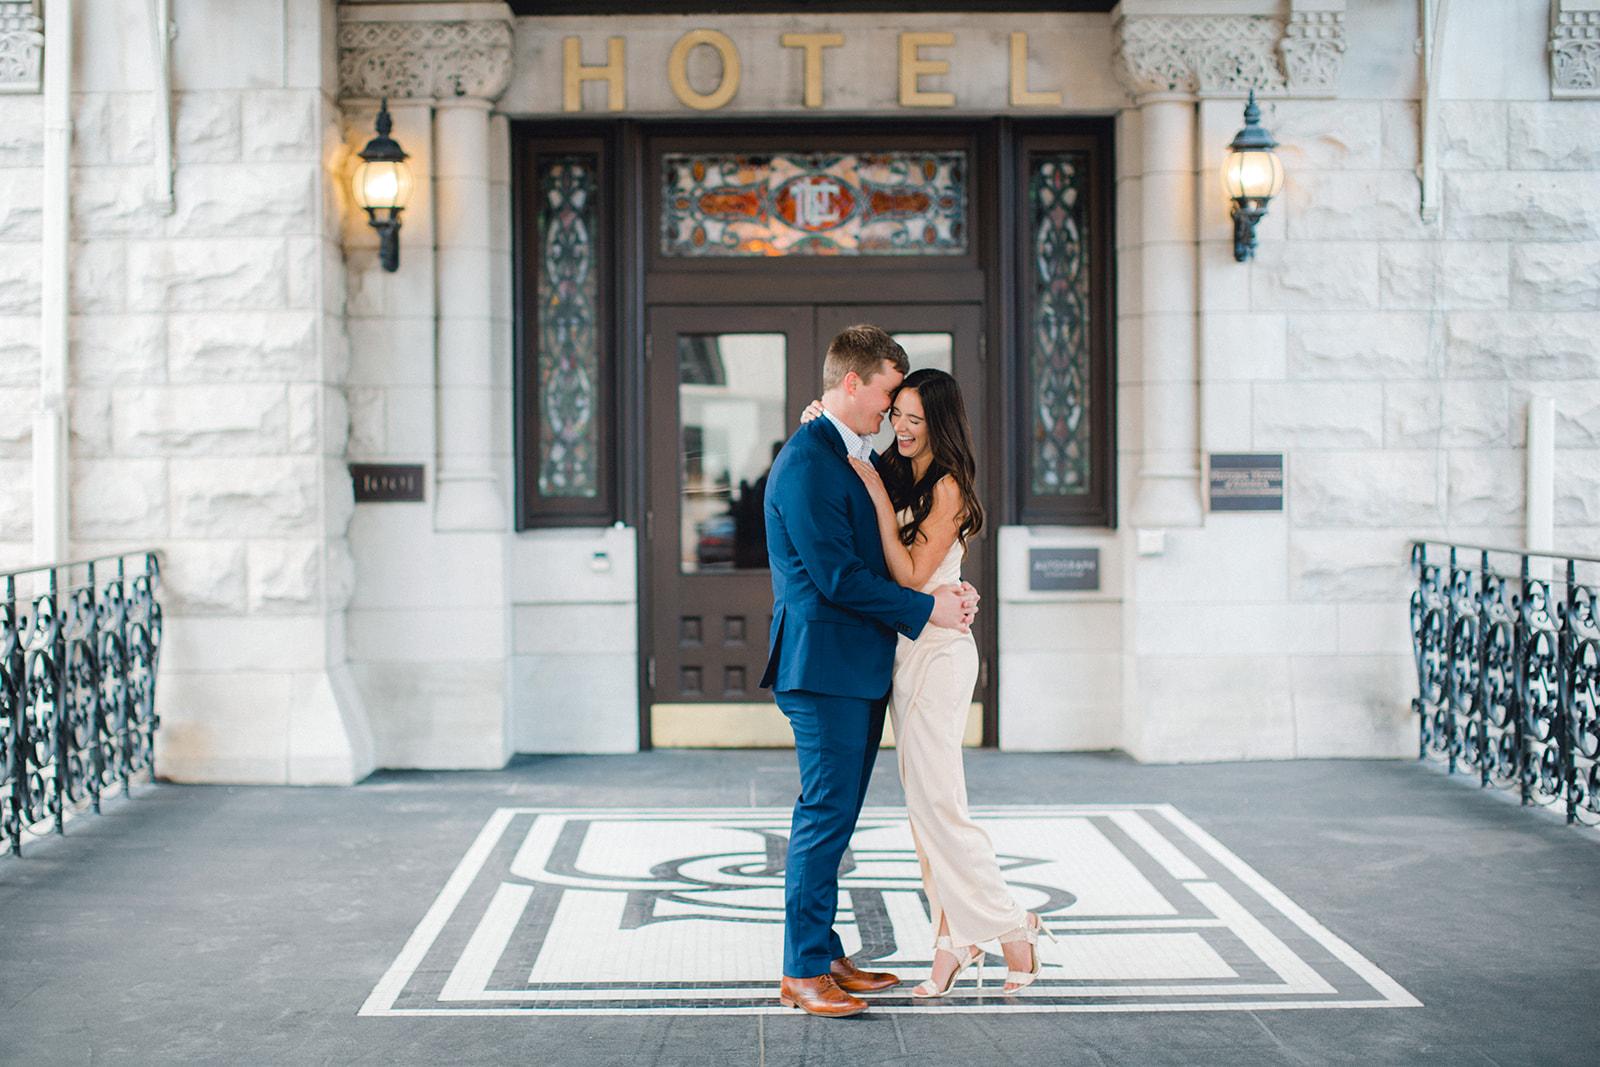 Union Station Engagement Session by Ashton Brooke Photography | Nashville Bride Guide